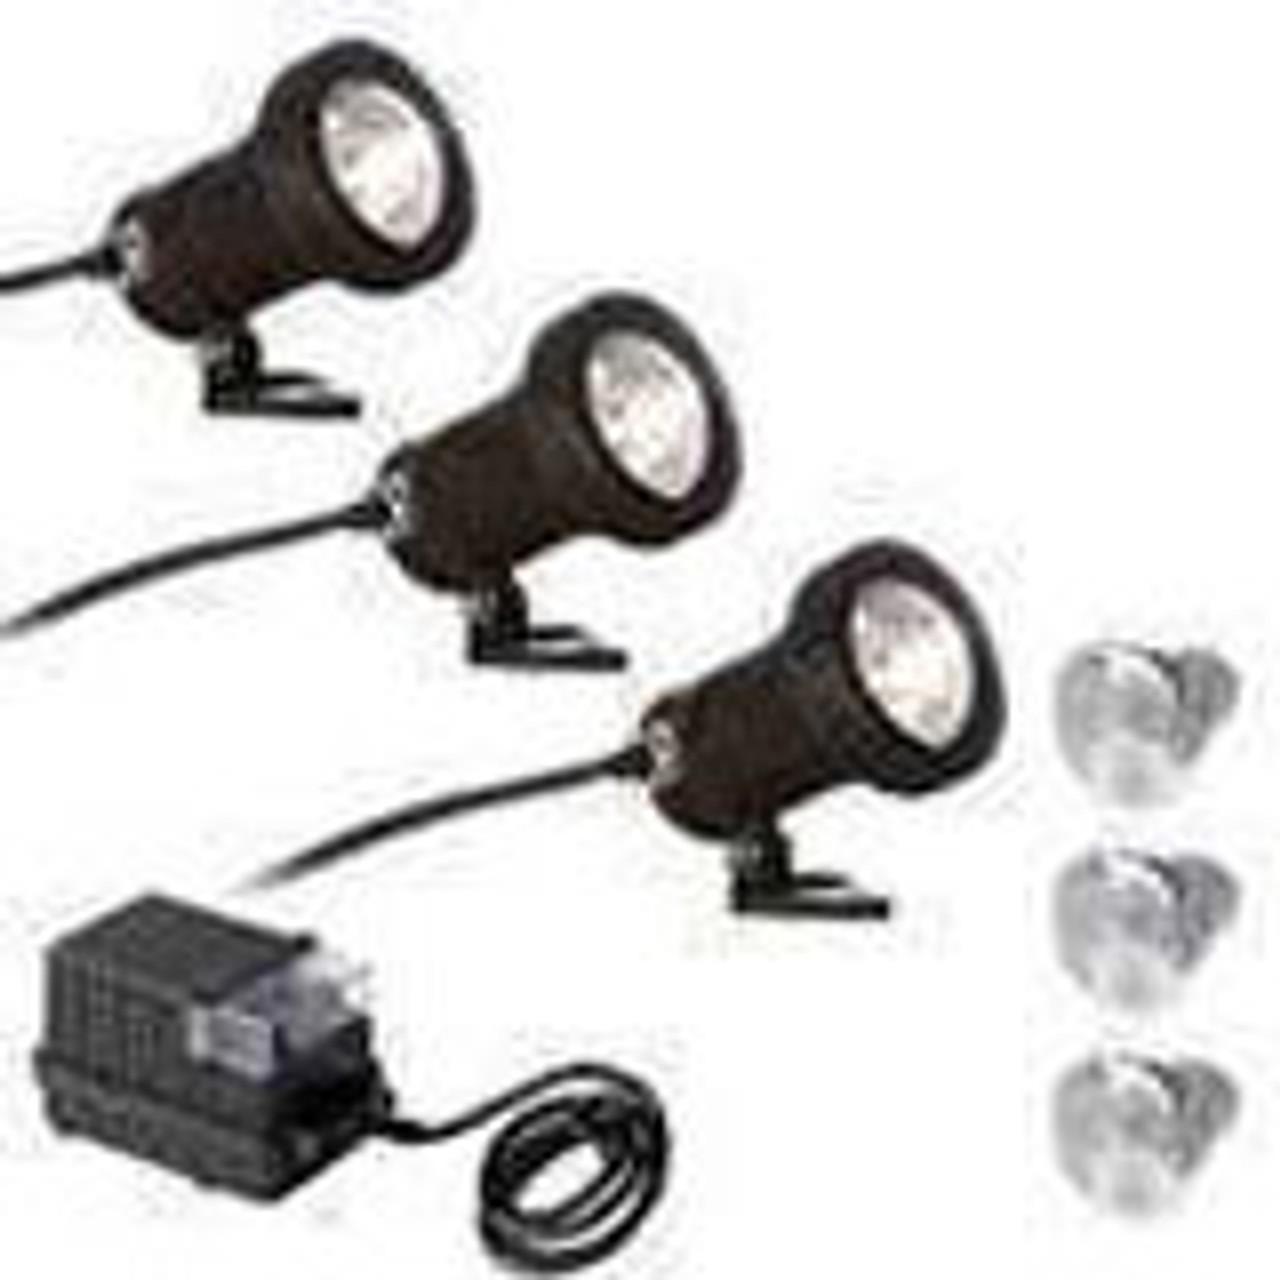 LED DIY Lighting Kits